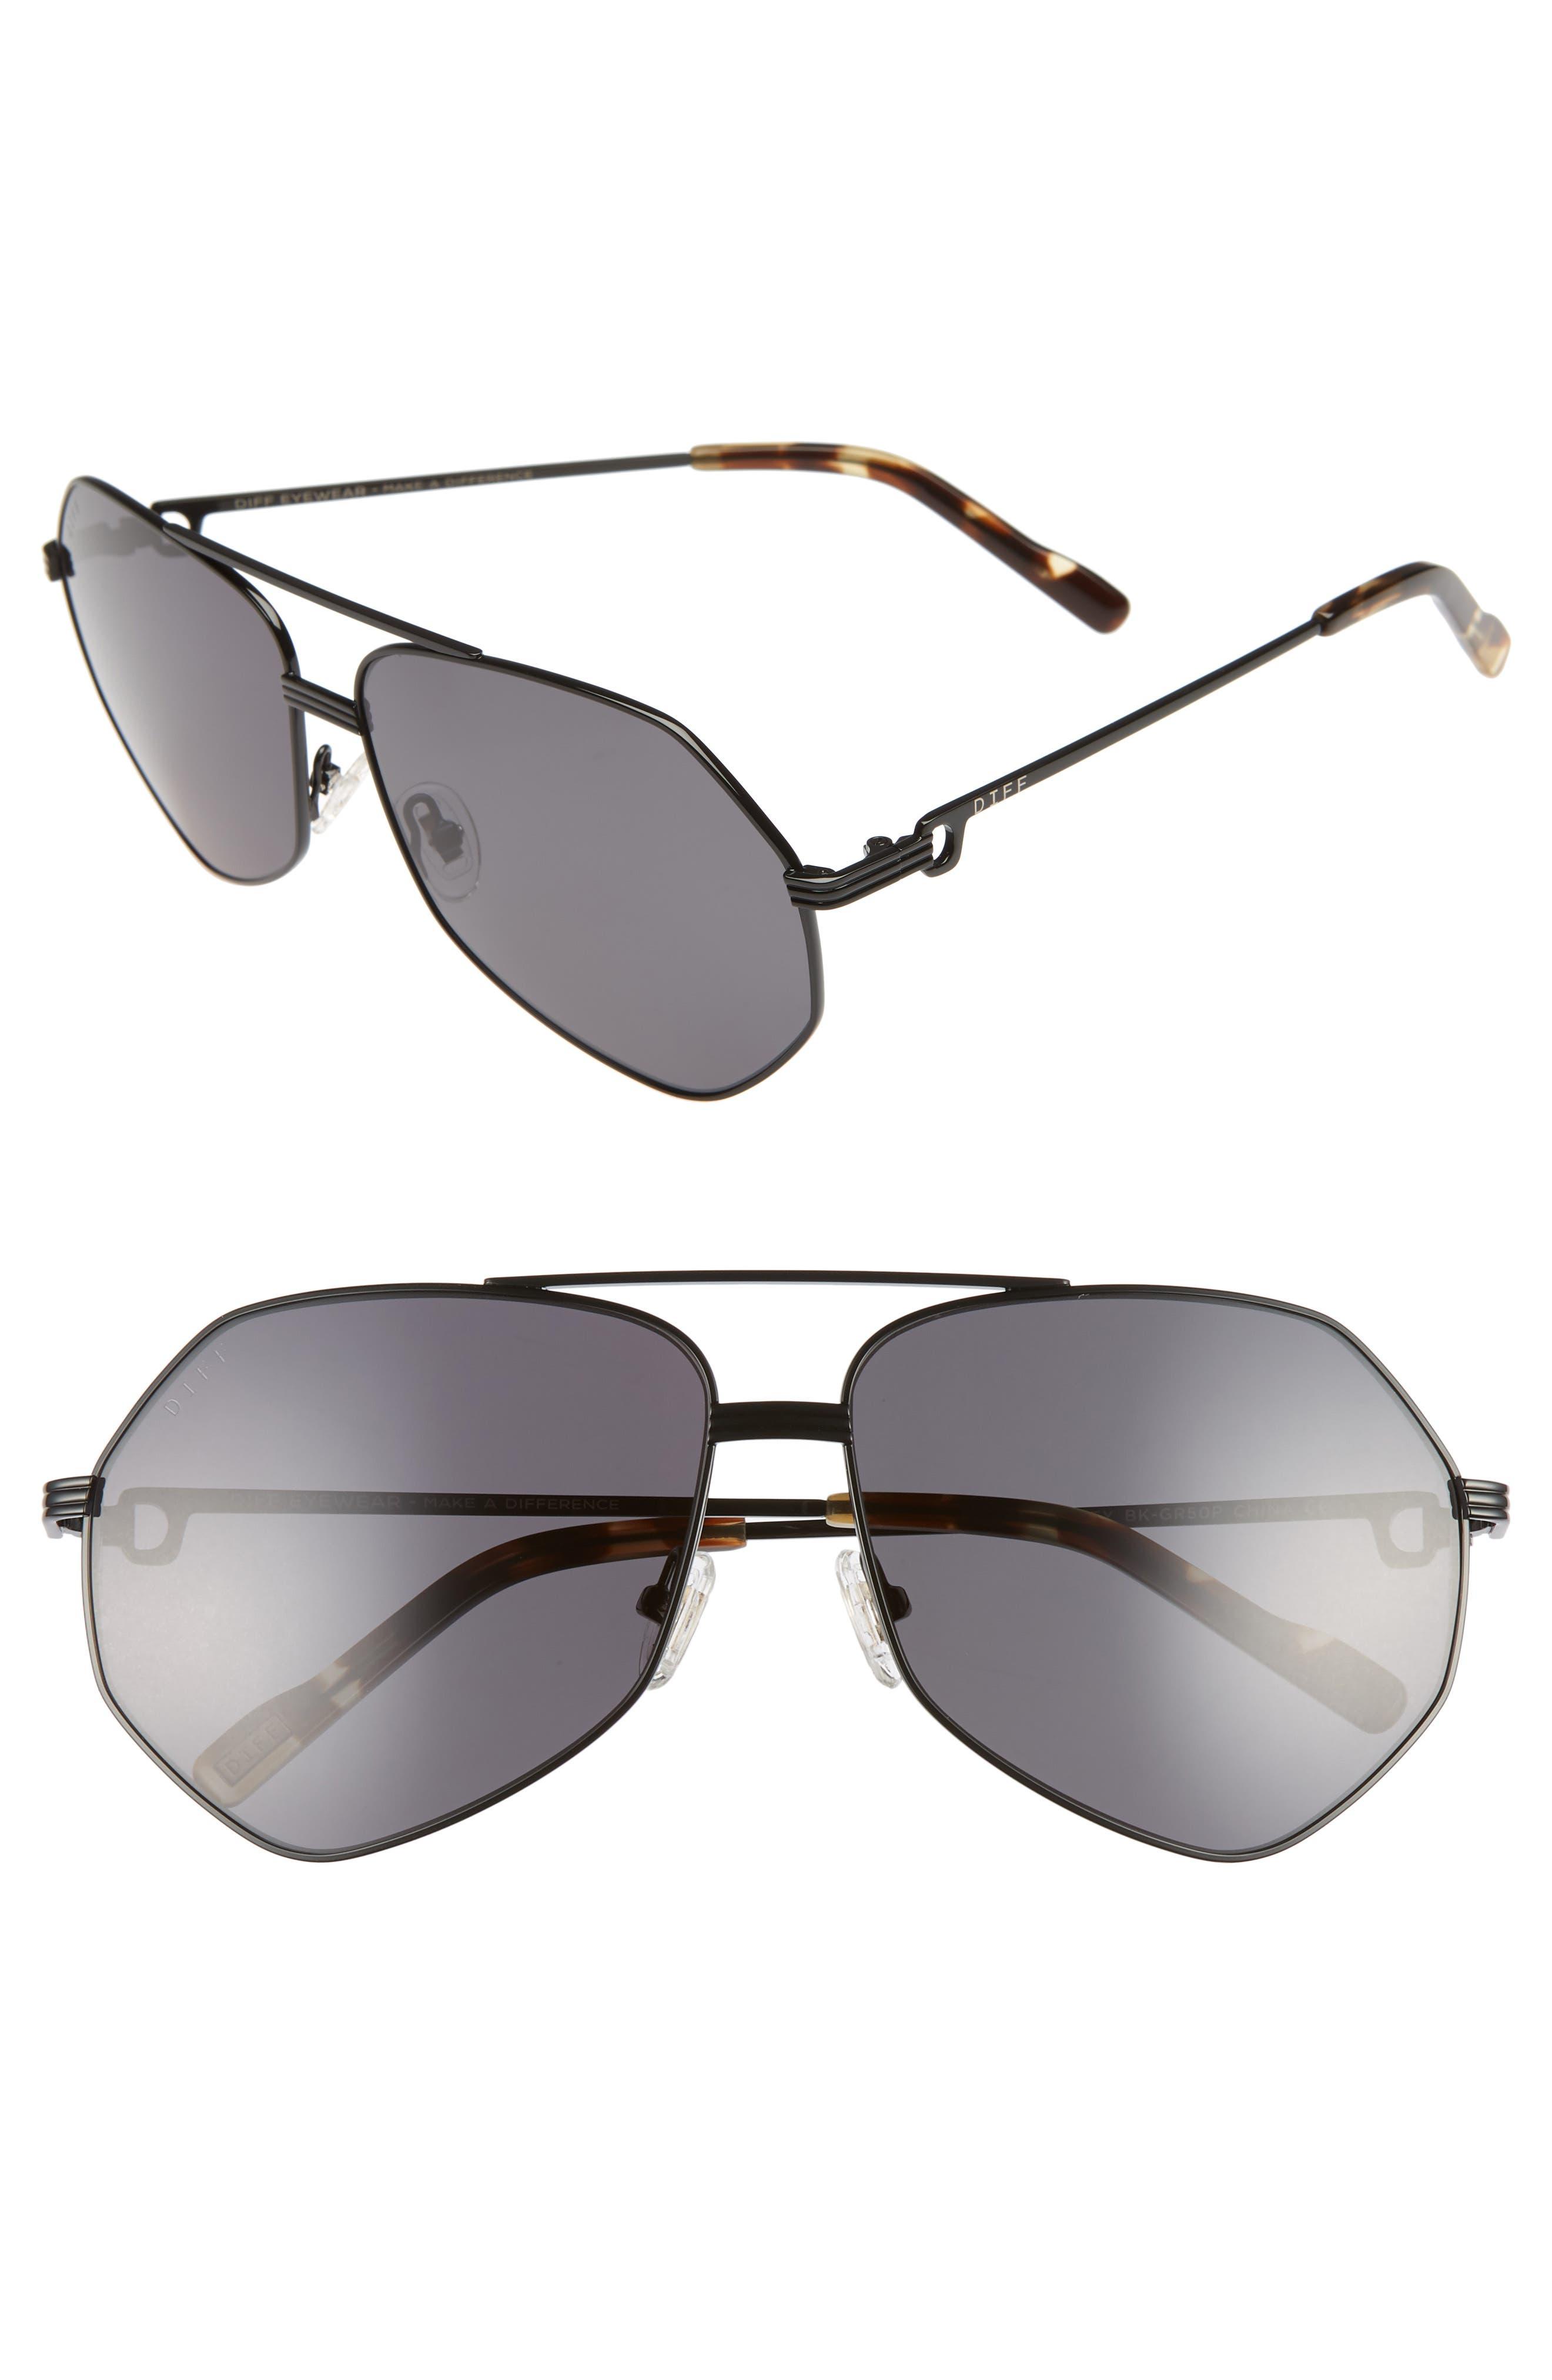 Sydney 62mm Polarized Aviator Sunglasses,                             Main thumbnail 1, color,                             BLACK/ MOSS HAVANA/ GREY